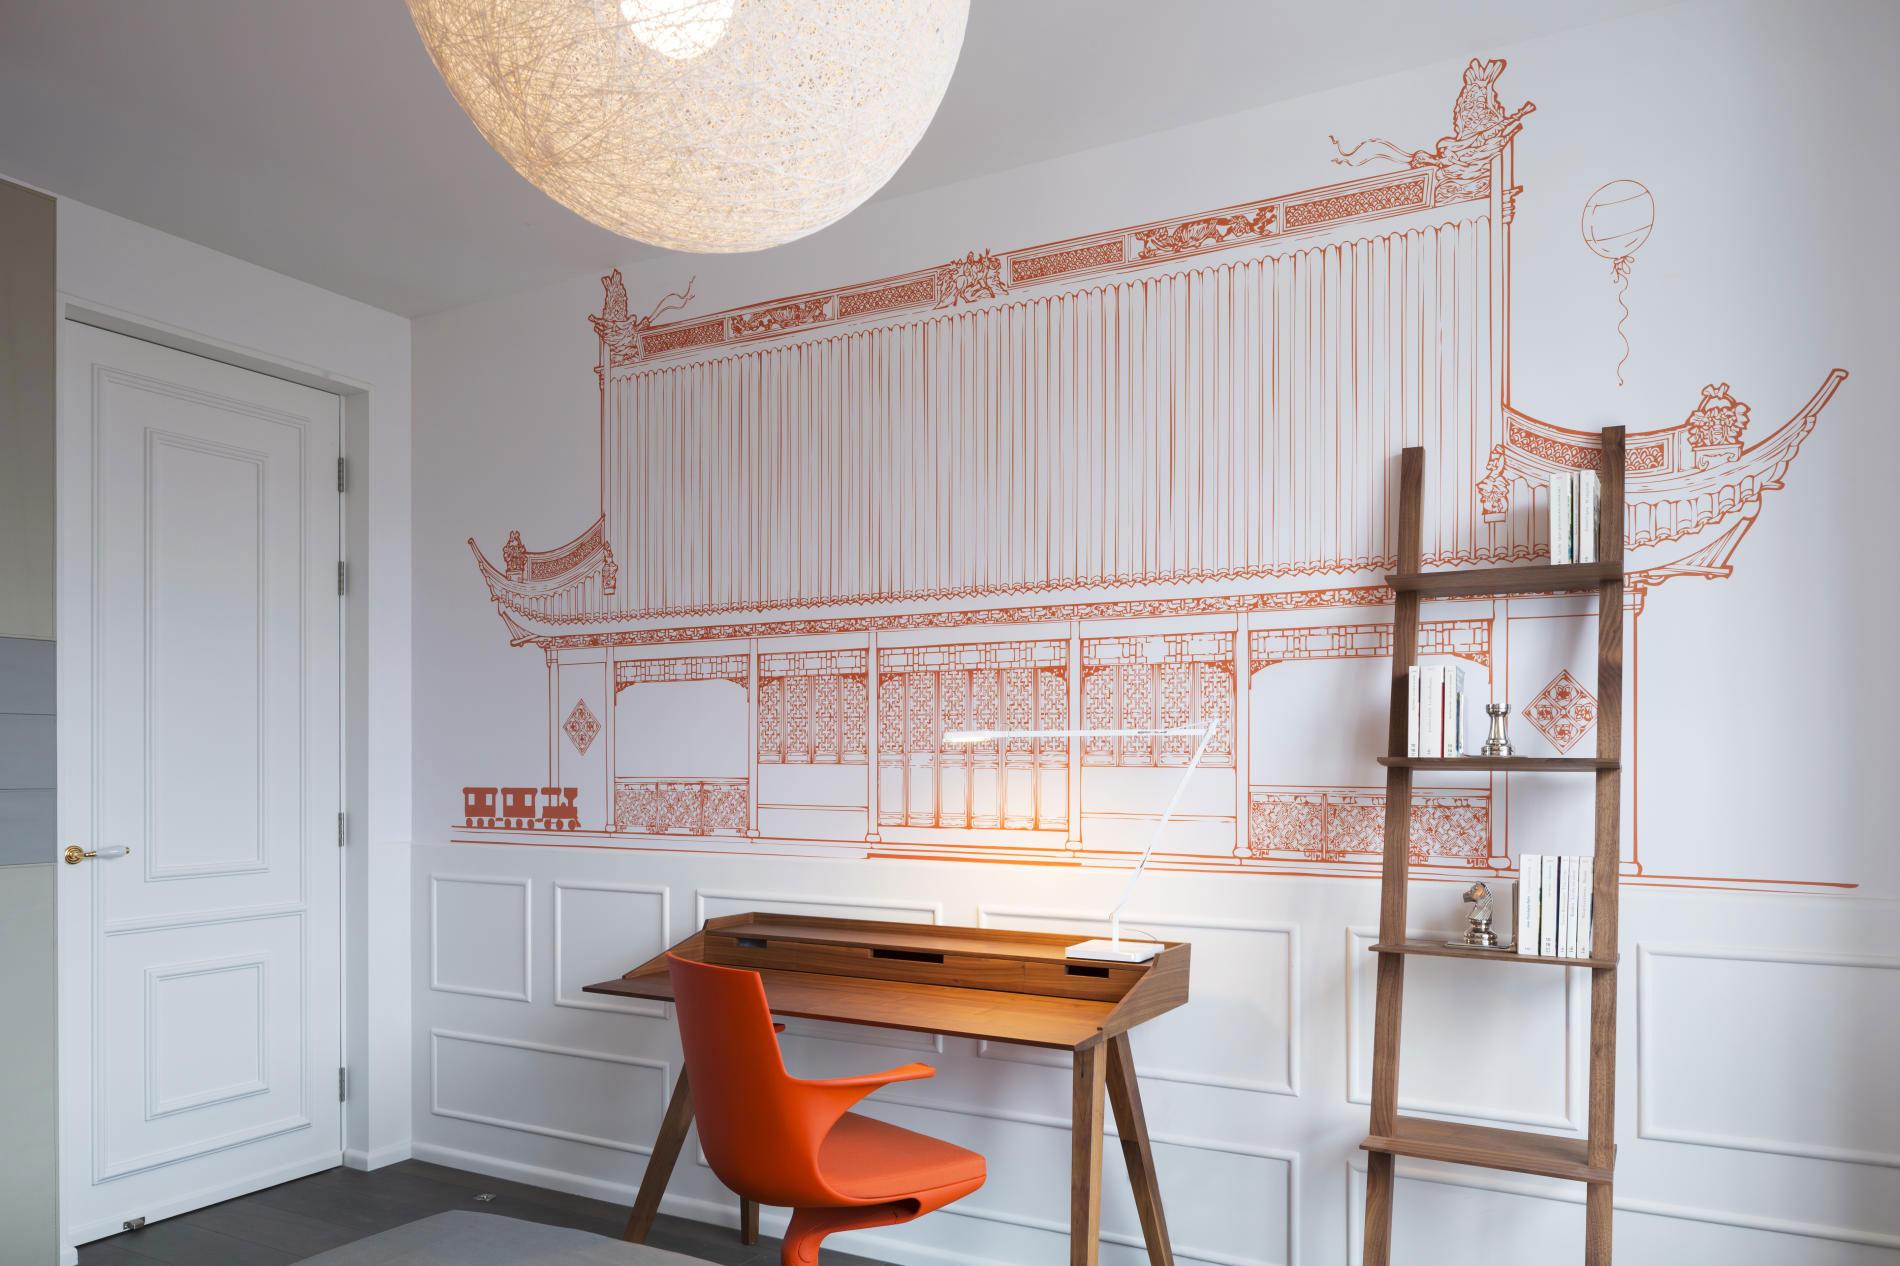 Рисунок дворца на стене гостиной